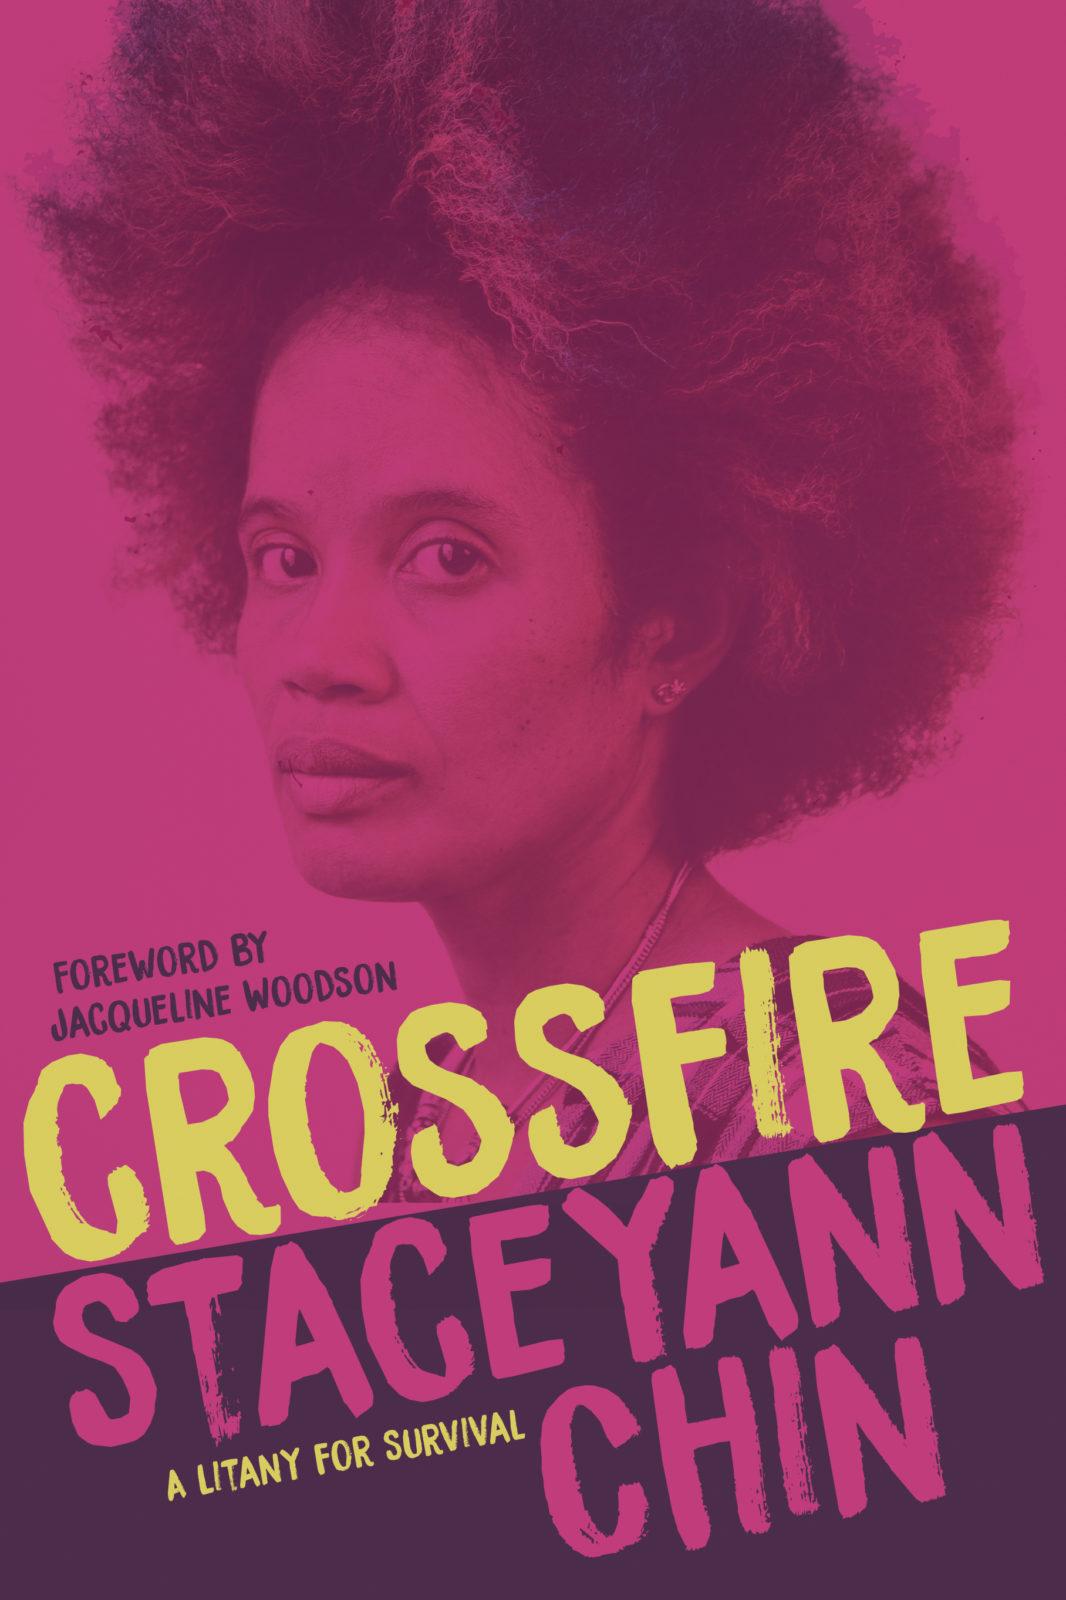 Crossfire-Chin-cover_4_3